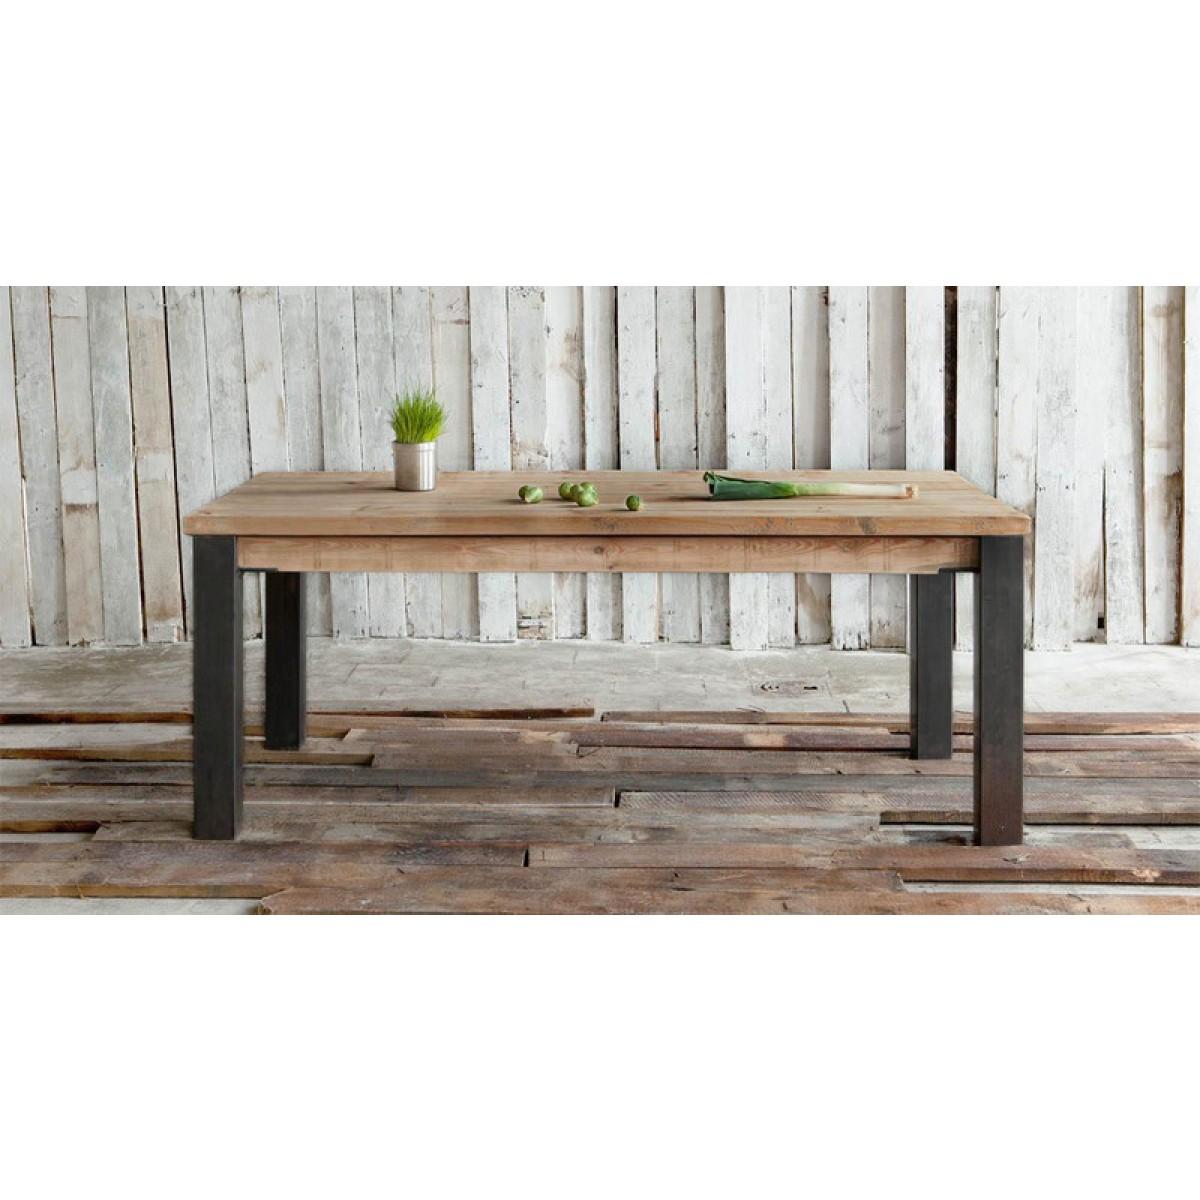 FraaiBerlin – Esstisch aus Bauholz & Eisen Arles